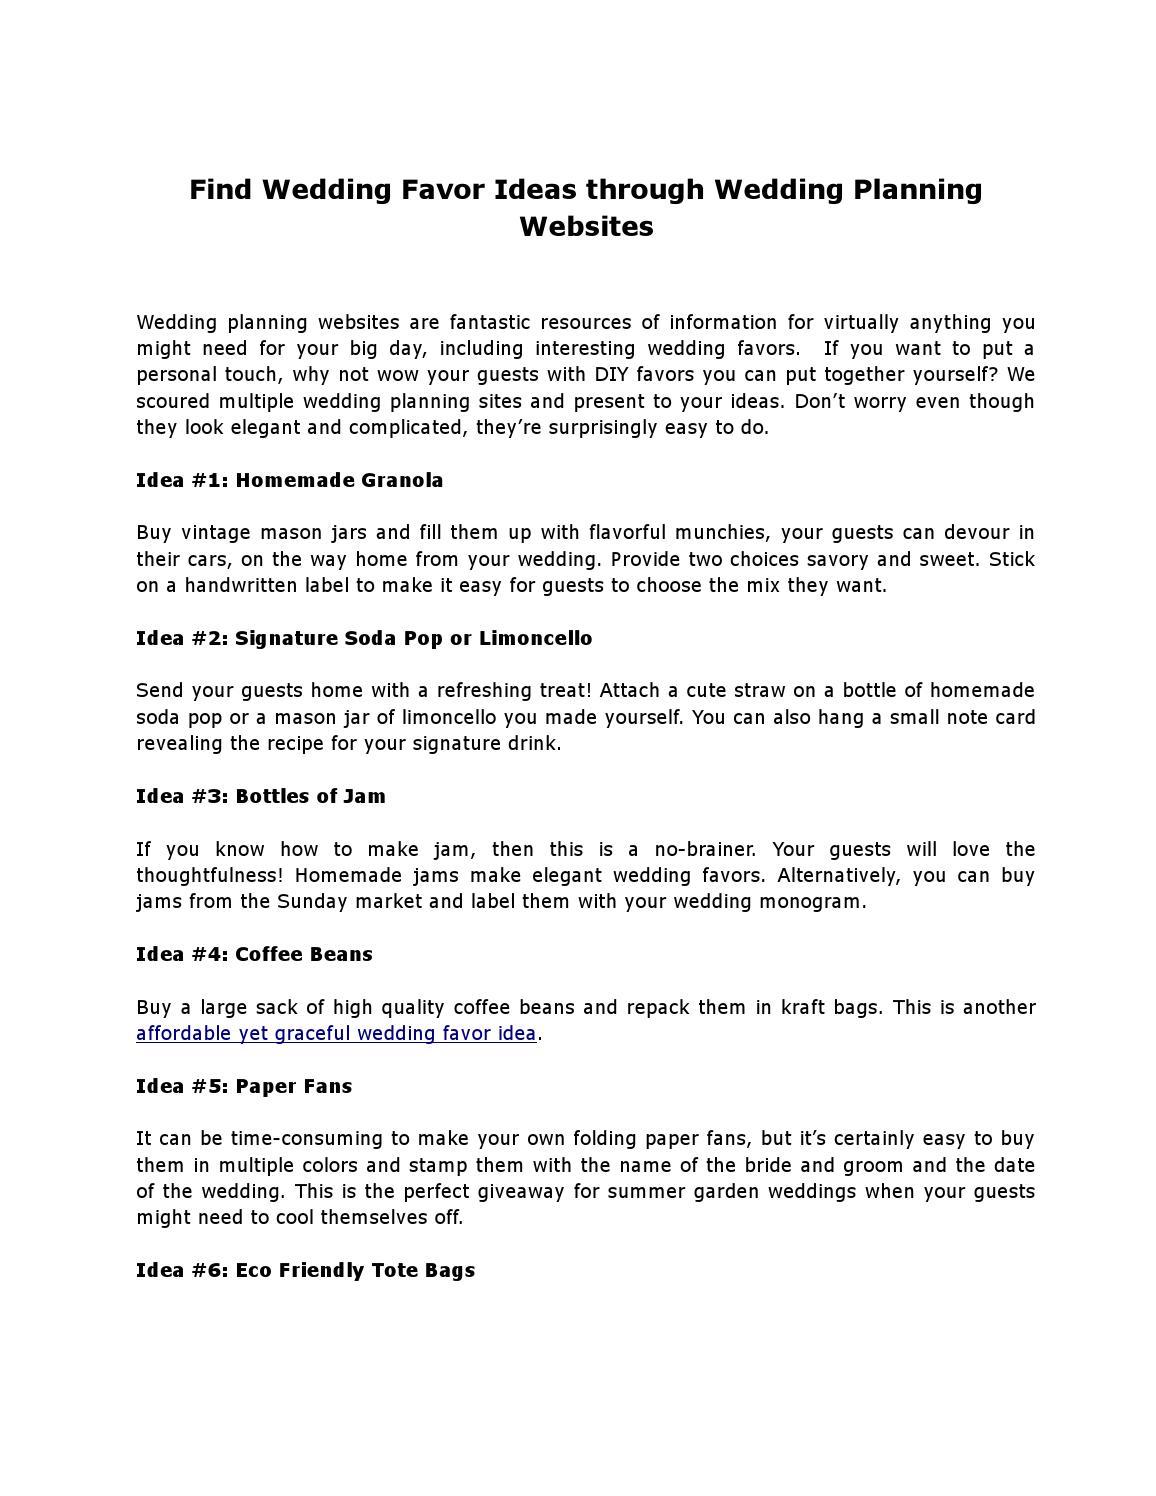 Find Wedding Favor Ideas through Wedding Planning Websites by ...